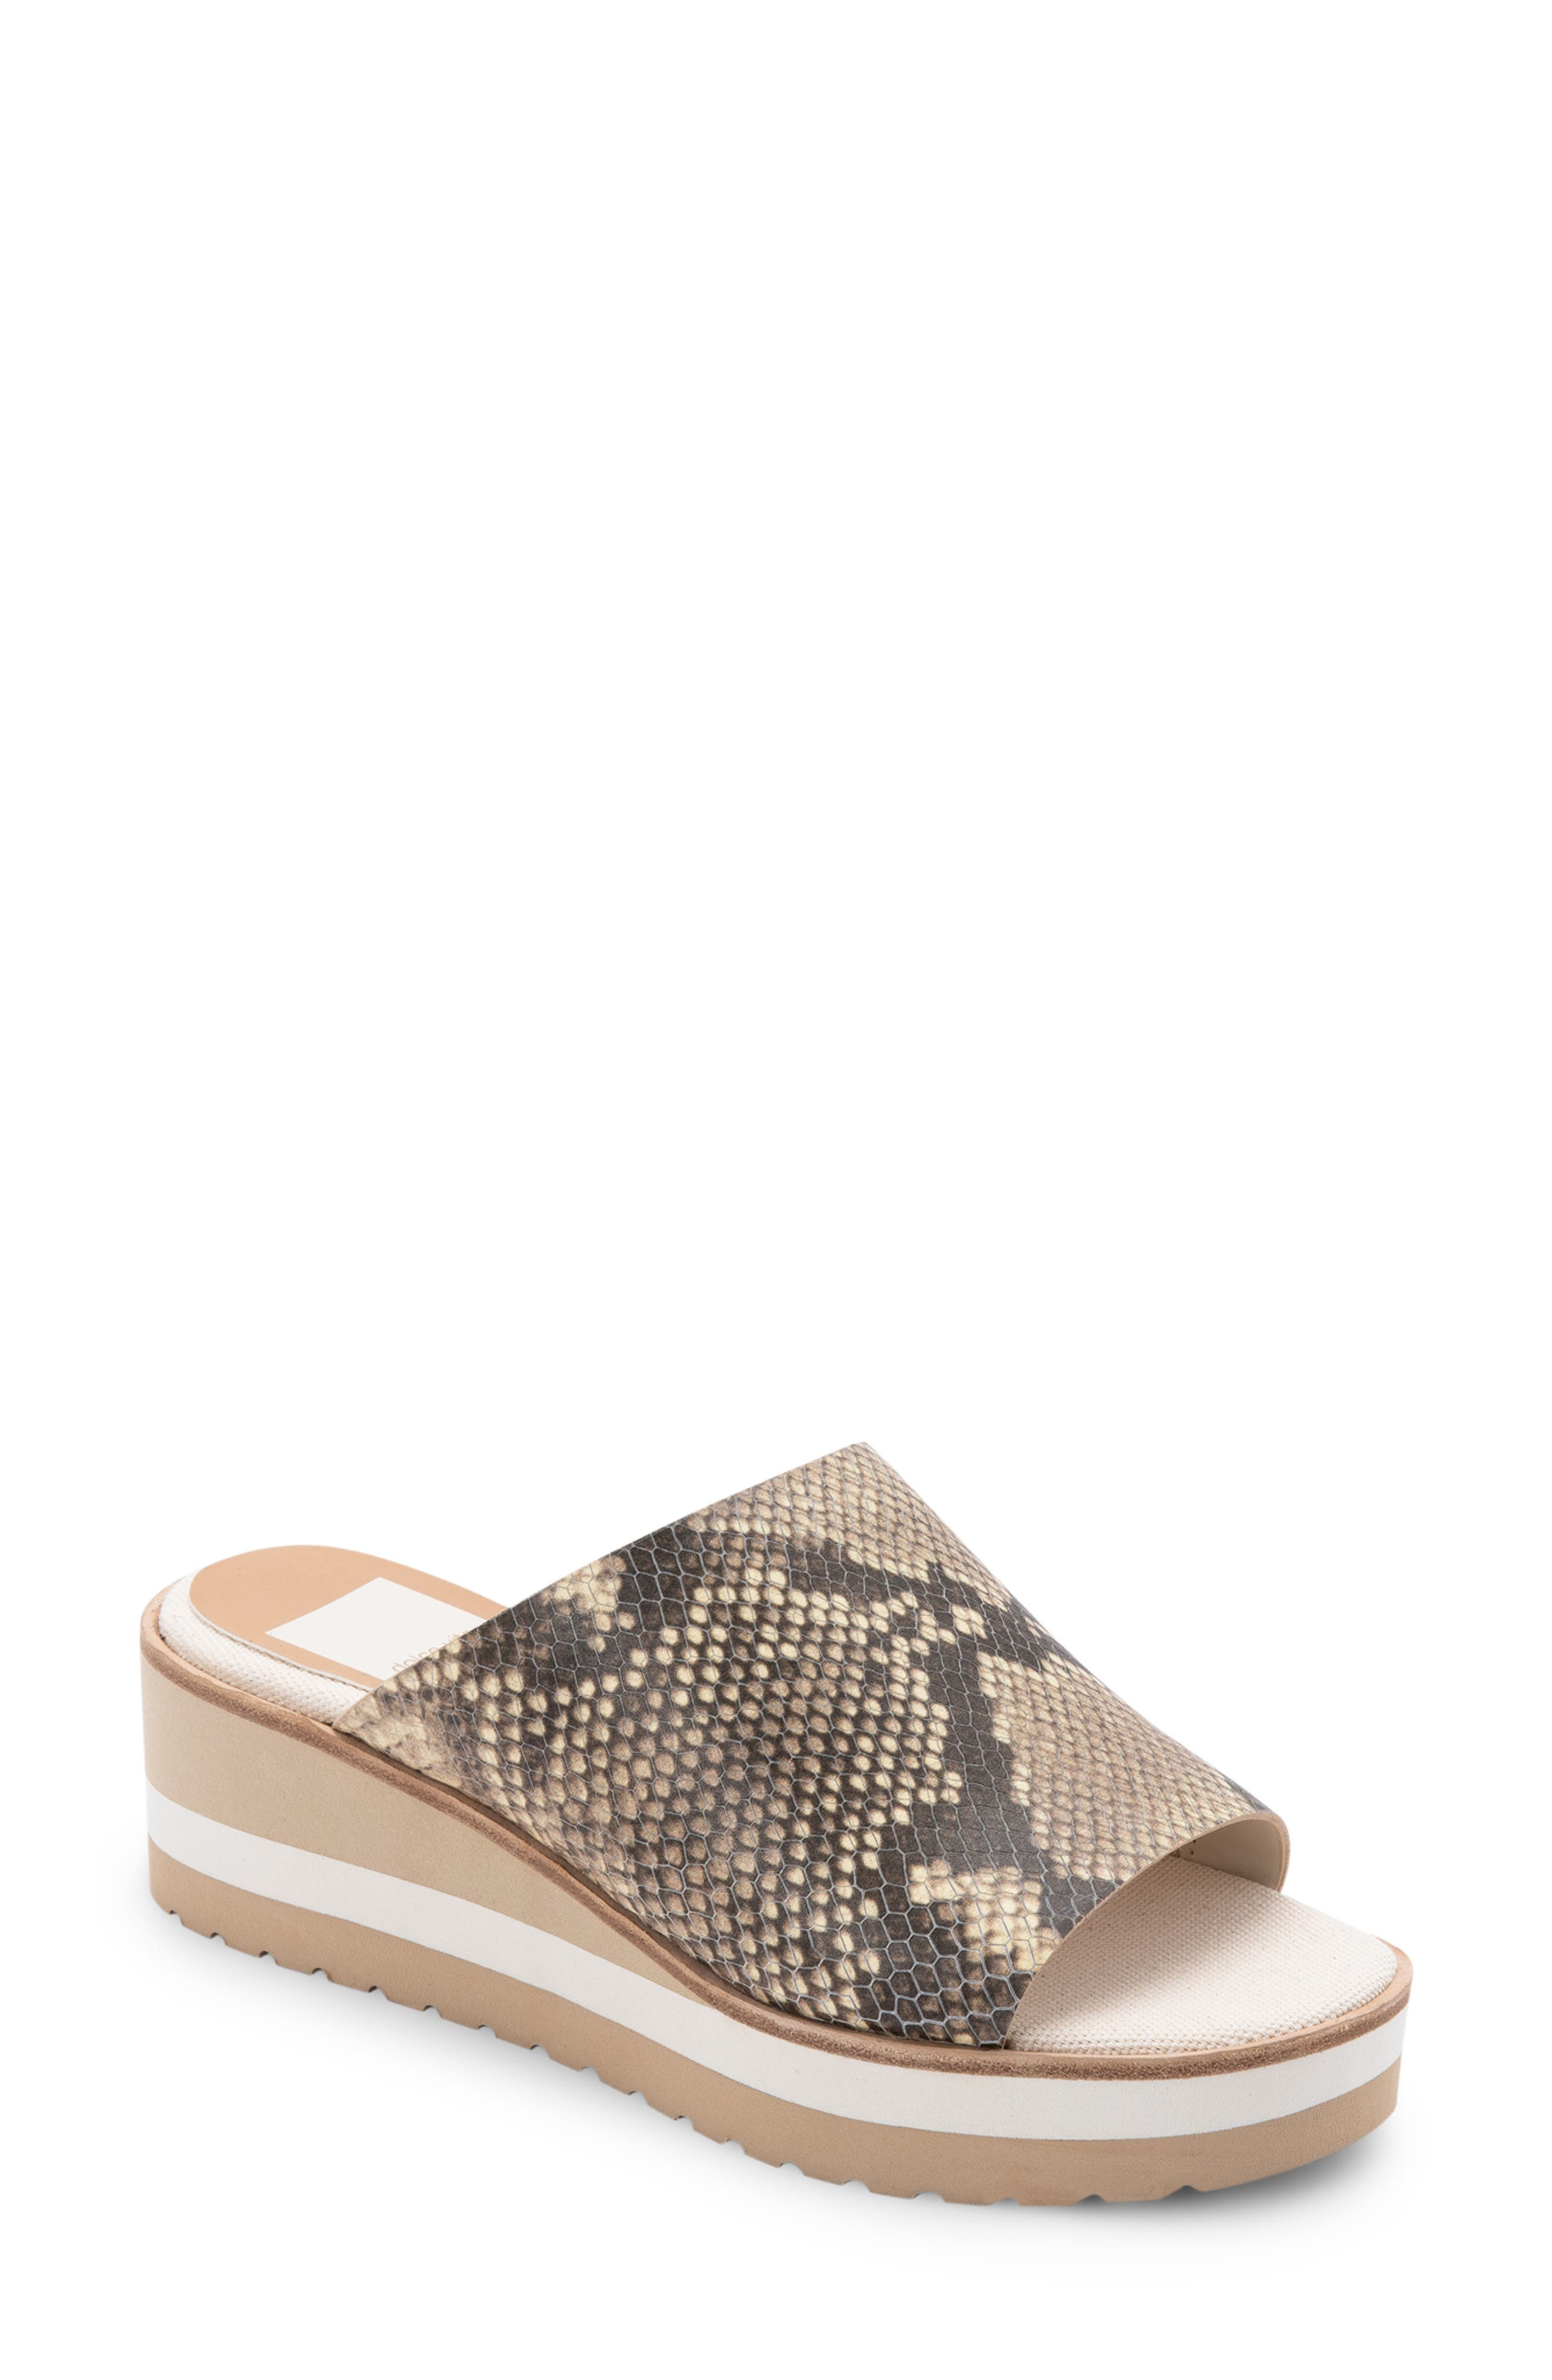 Freta Platform Wedge Sandal